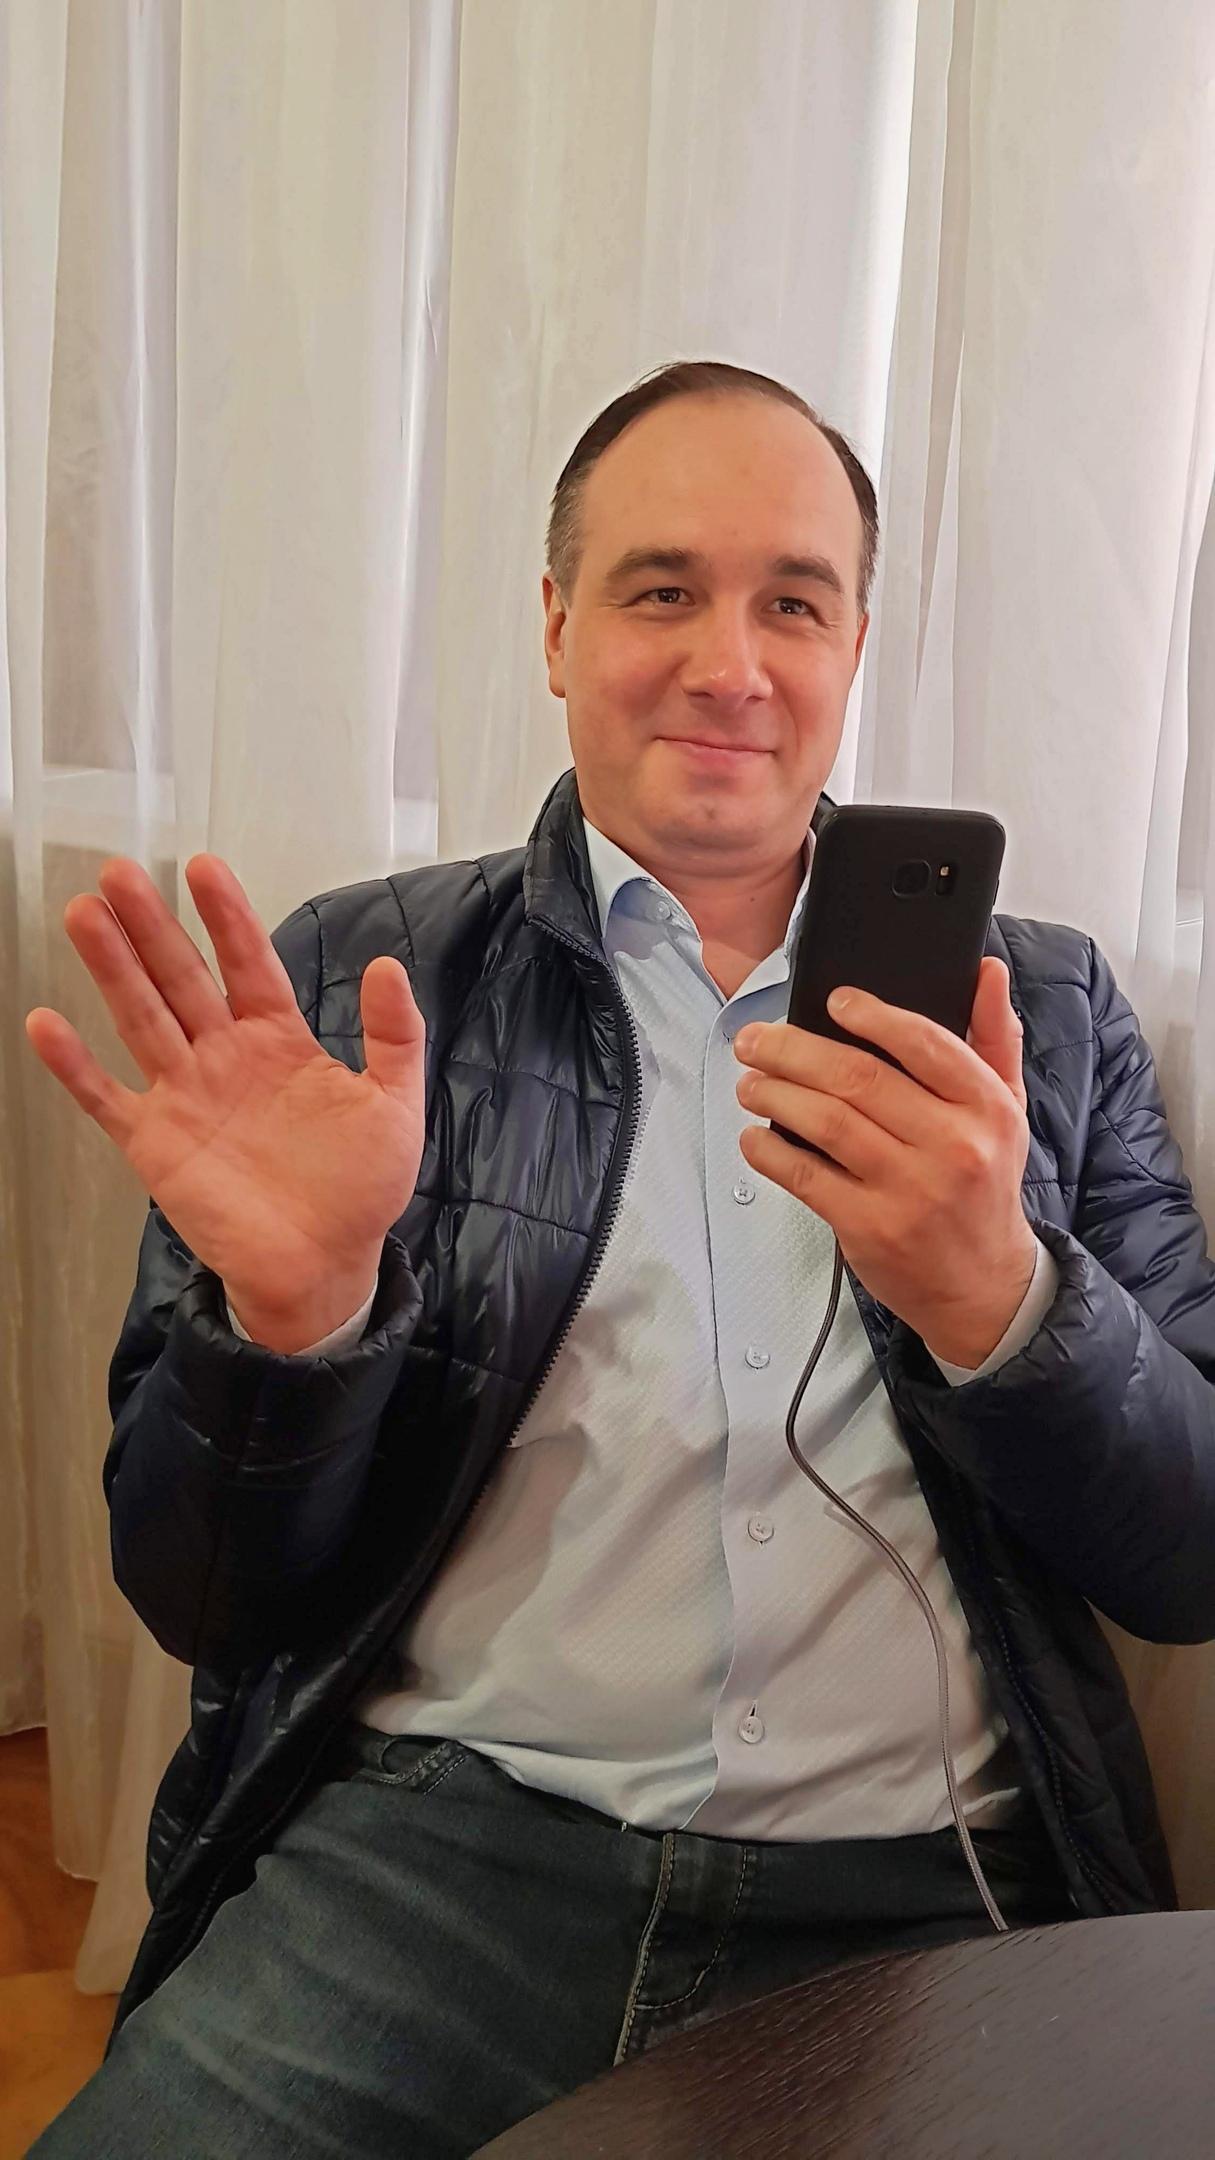 "АКЦИЯ ""ПРОСМОТР НА НАЛИЧИЕ МАГ. ВОЗДЕЙСТВИЯ"" на рунах от missss - Страница 2 3mkg_TxBdKc"